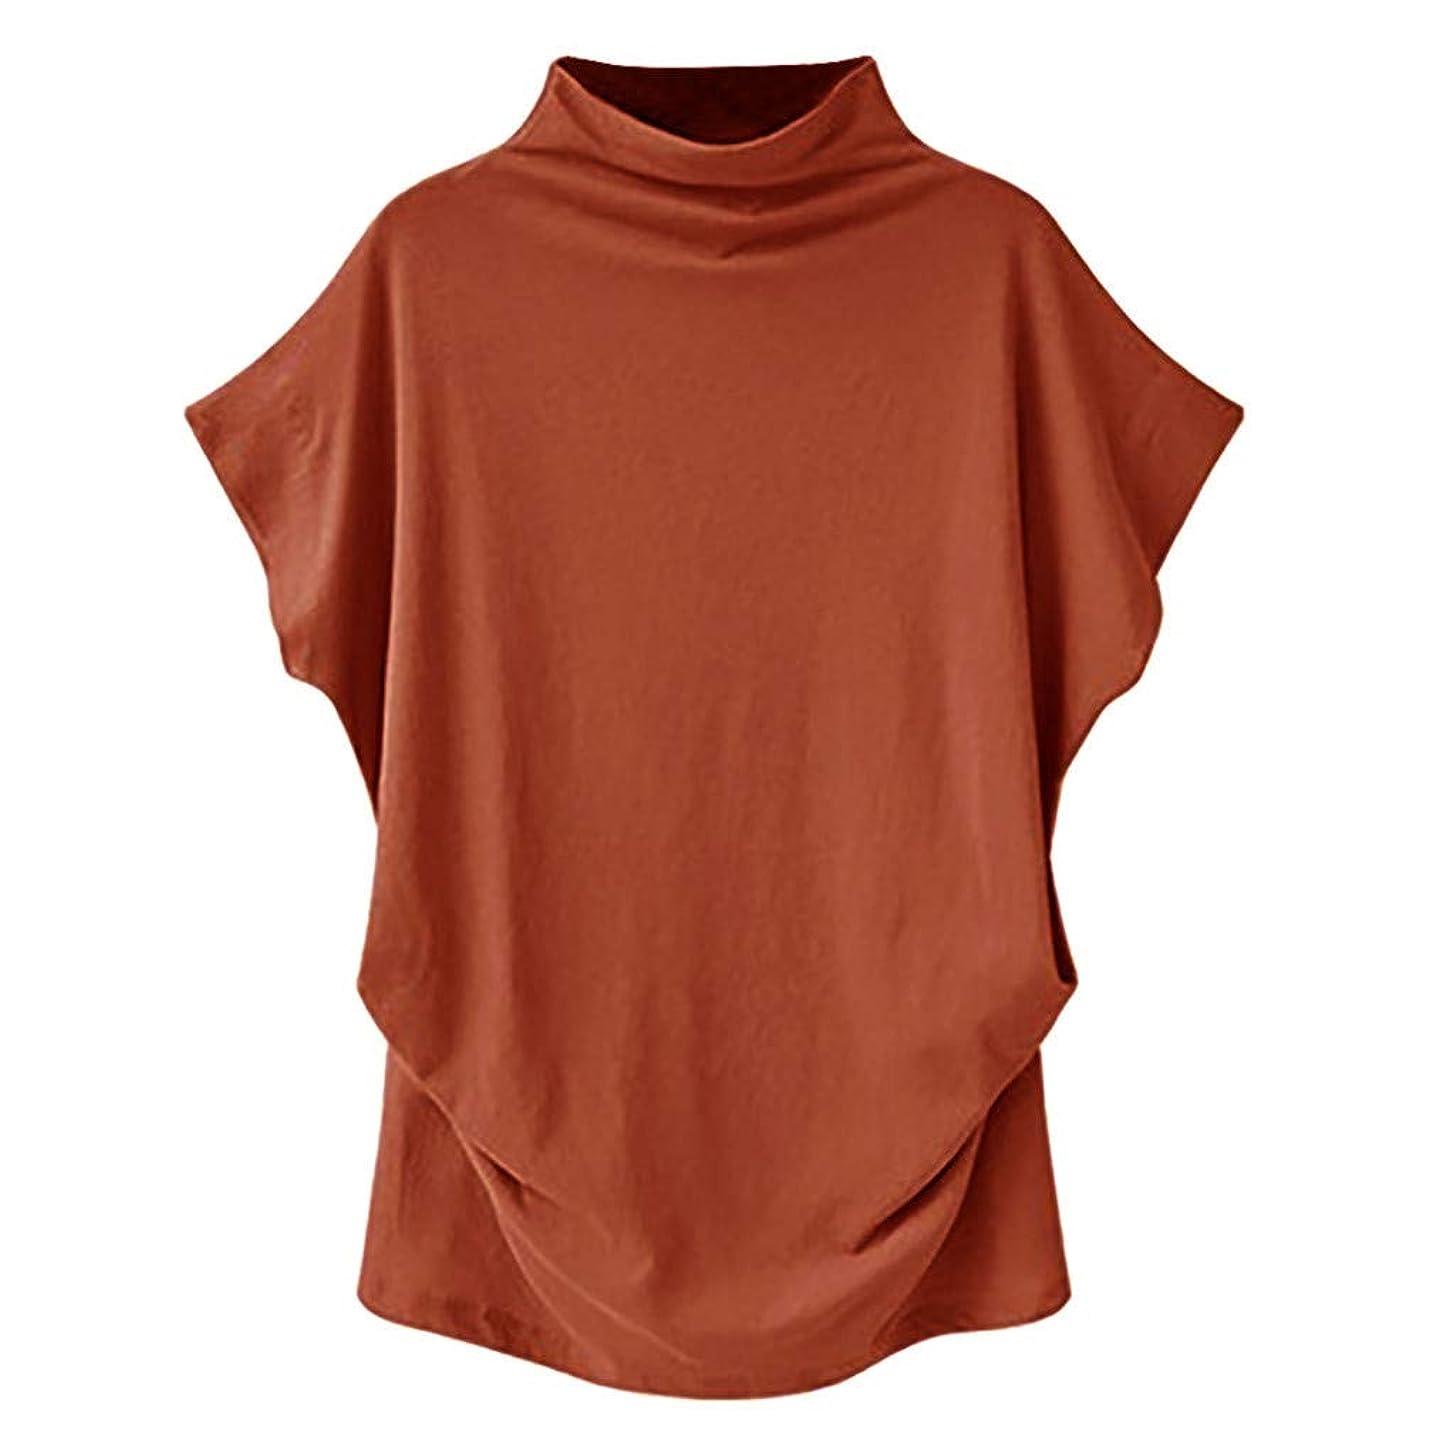 〓COOlCCI〓Women Shirts Turtleneck Short Sleeve Cotton Blouse T Shirt Casual Loose Tunic Tops Loose Candy Colors Shirts